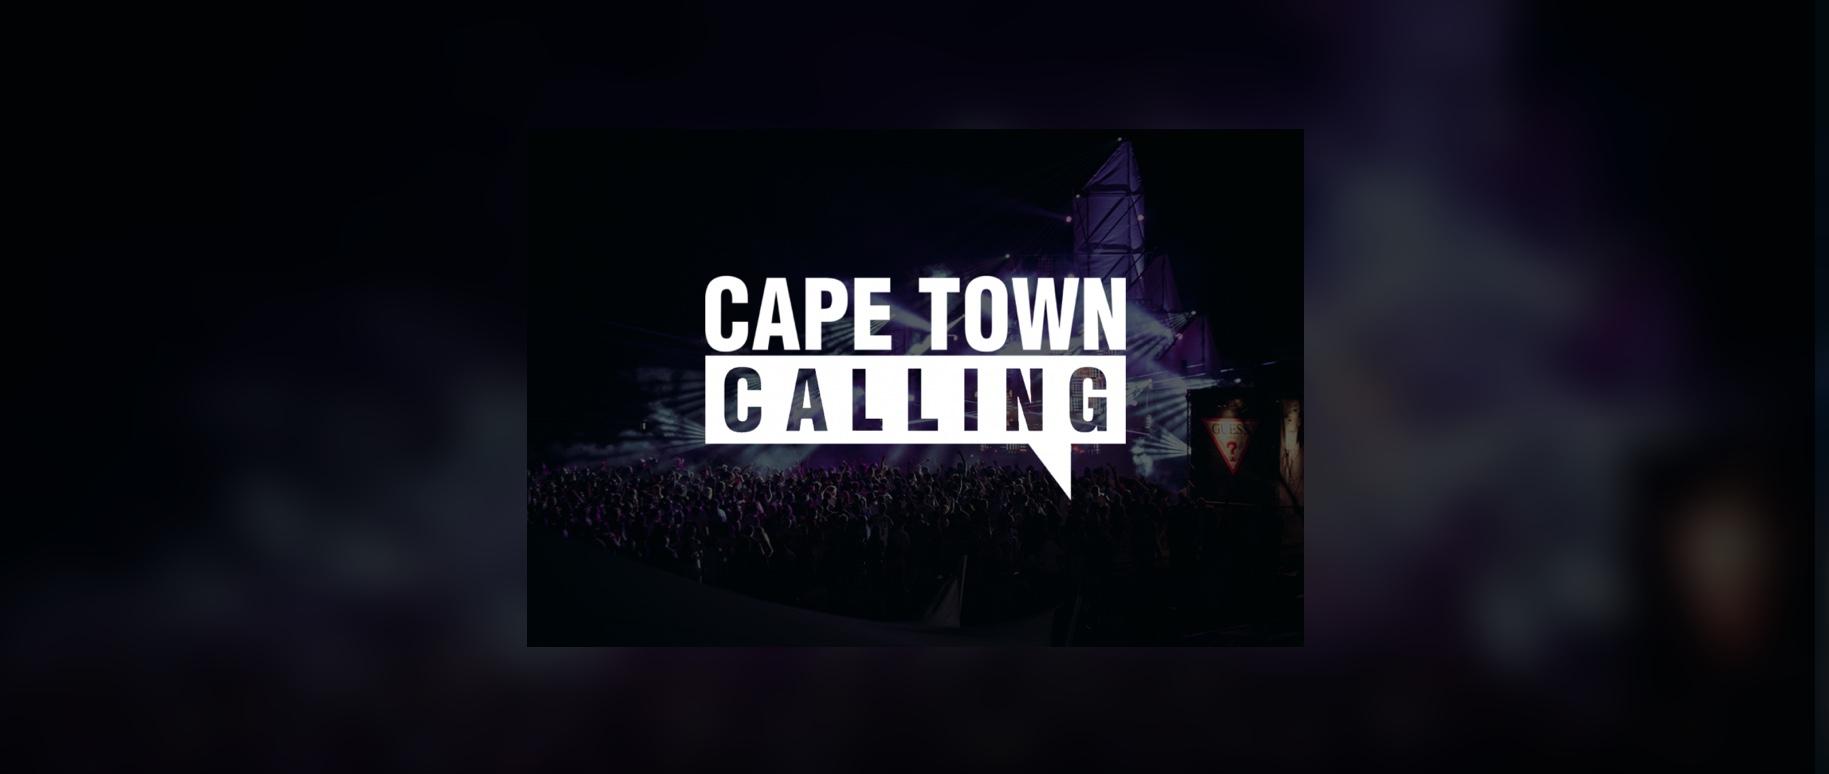 ct calling